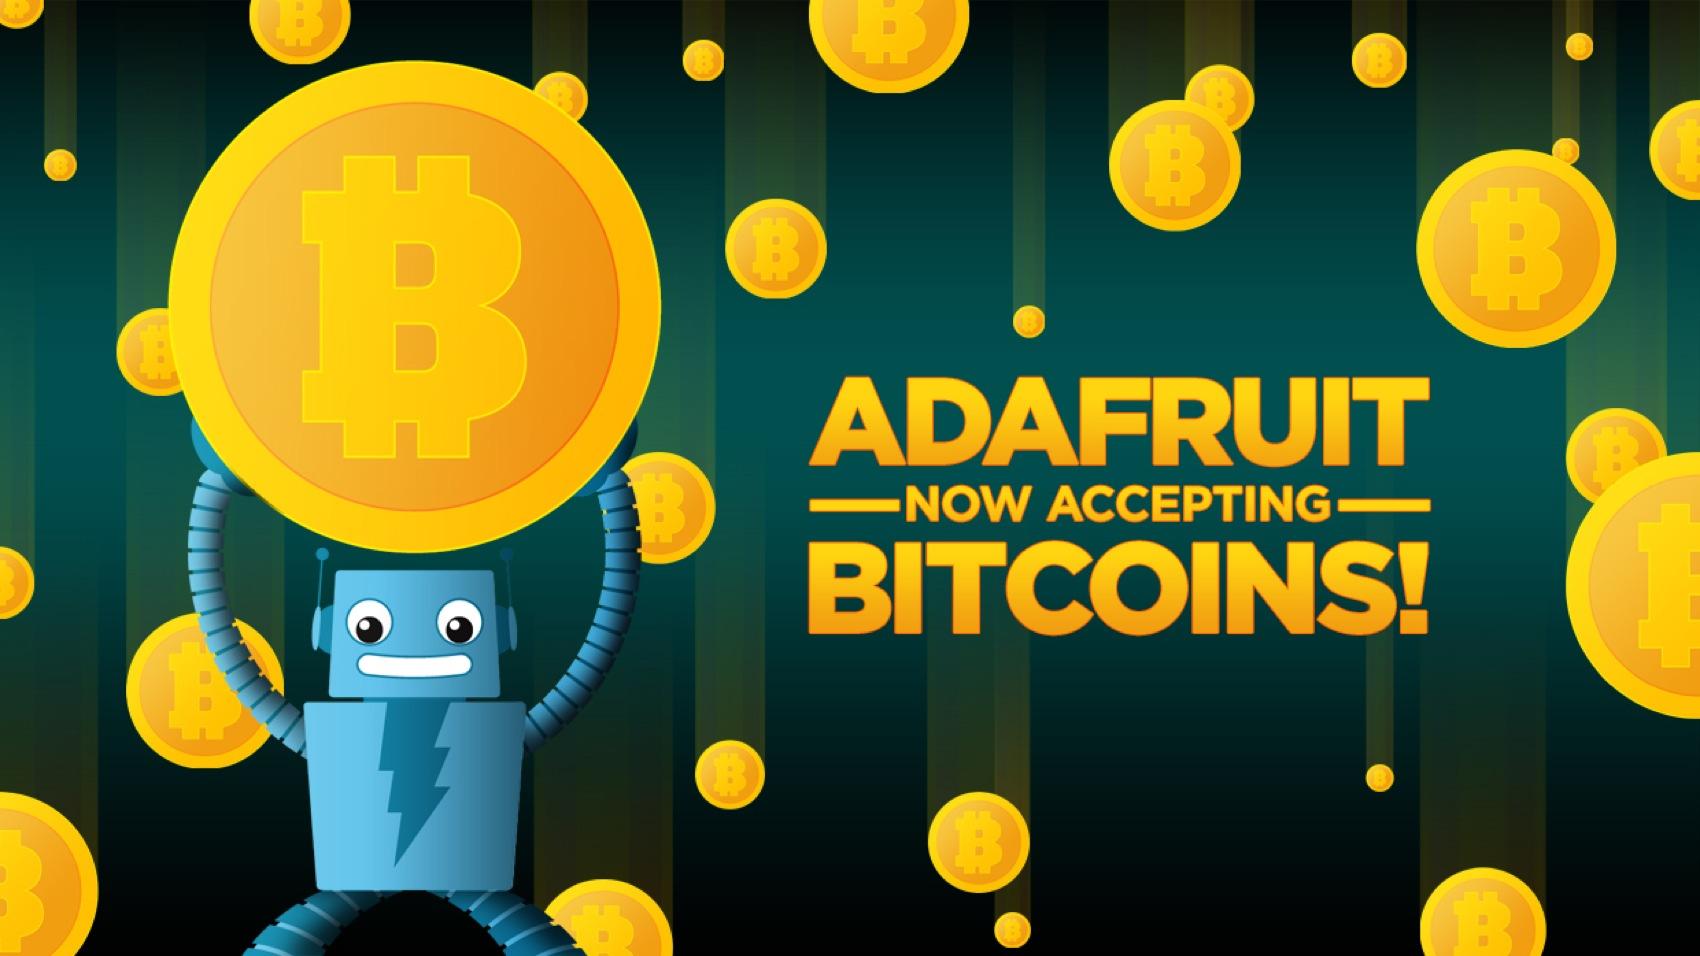 1280X698 Adafruit Bitcoin Banner